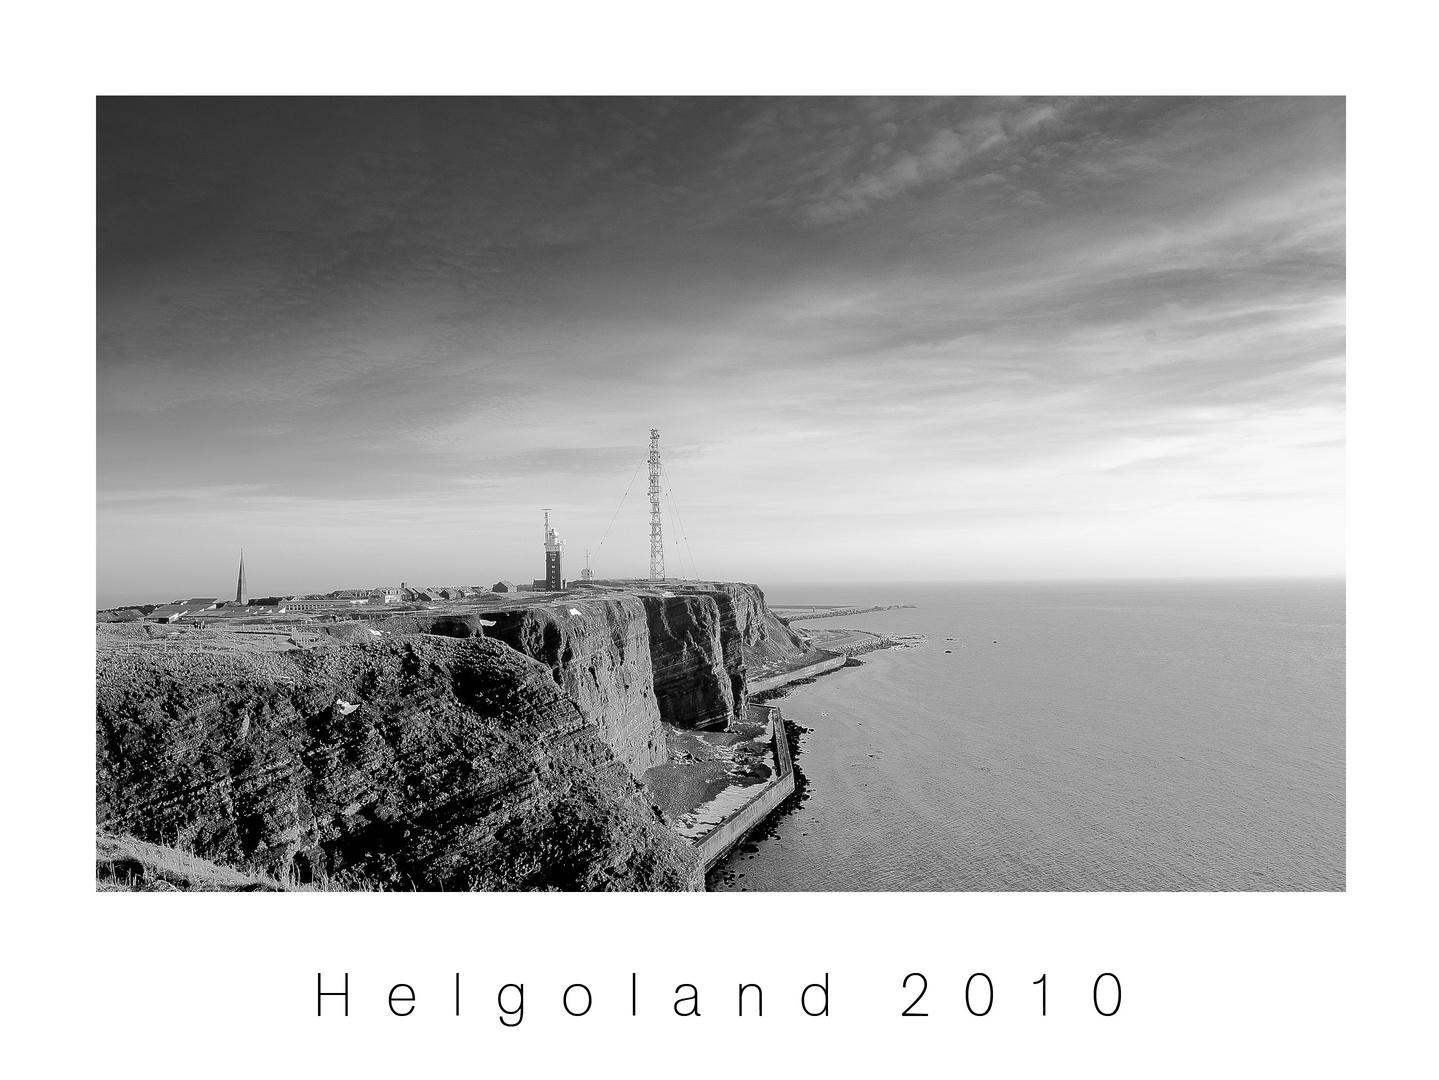 Helgoland 2010